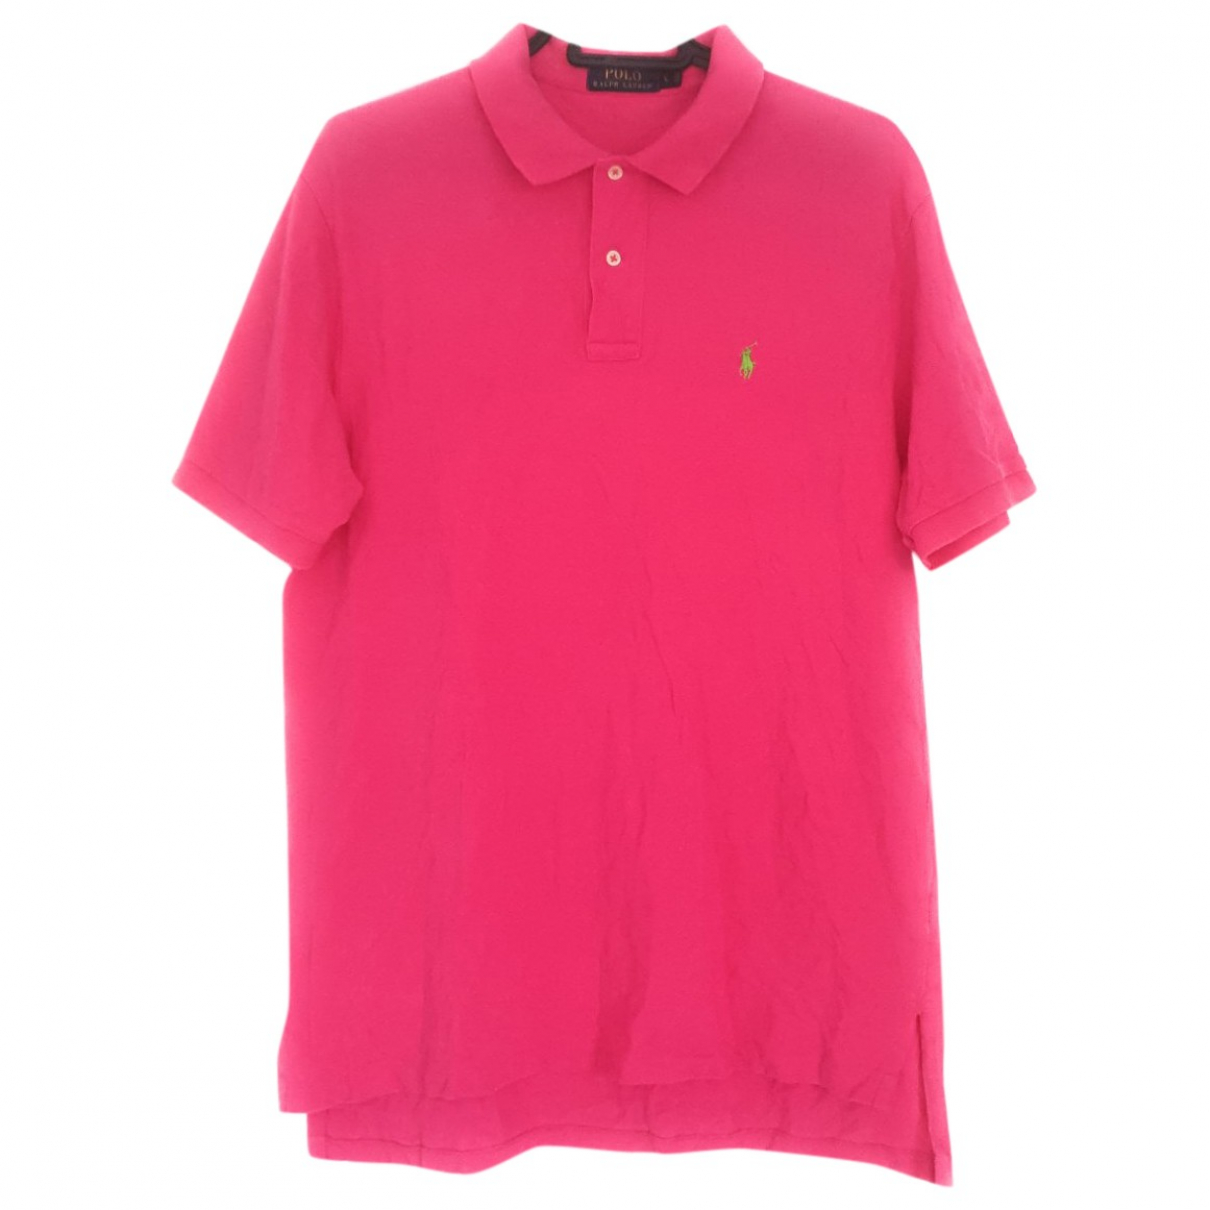 Polo Ralph Lauren Polo classique manches courtes Pink Cotton Polo shirts for Men L International